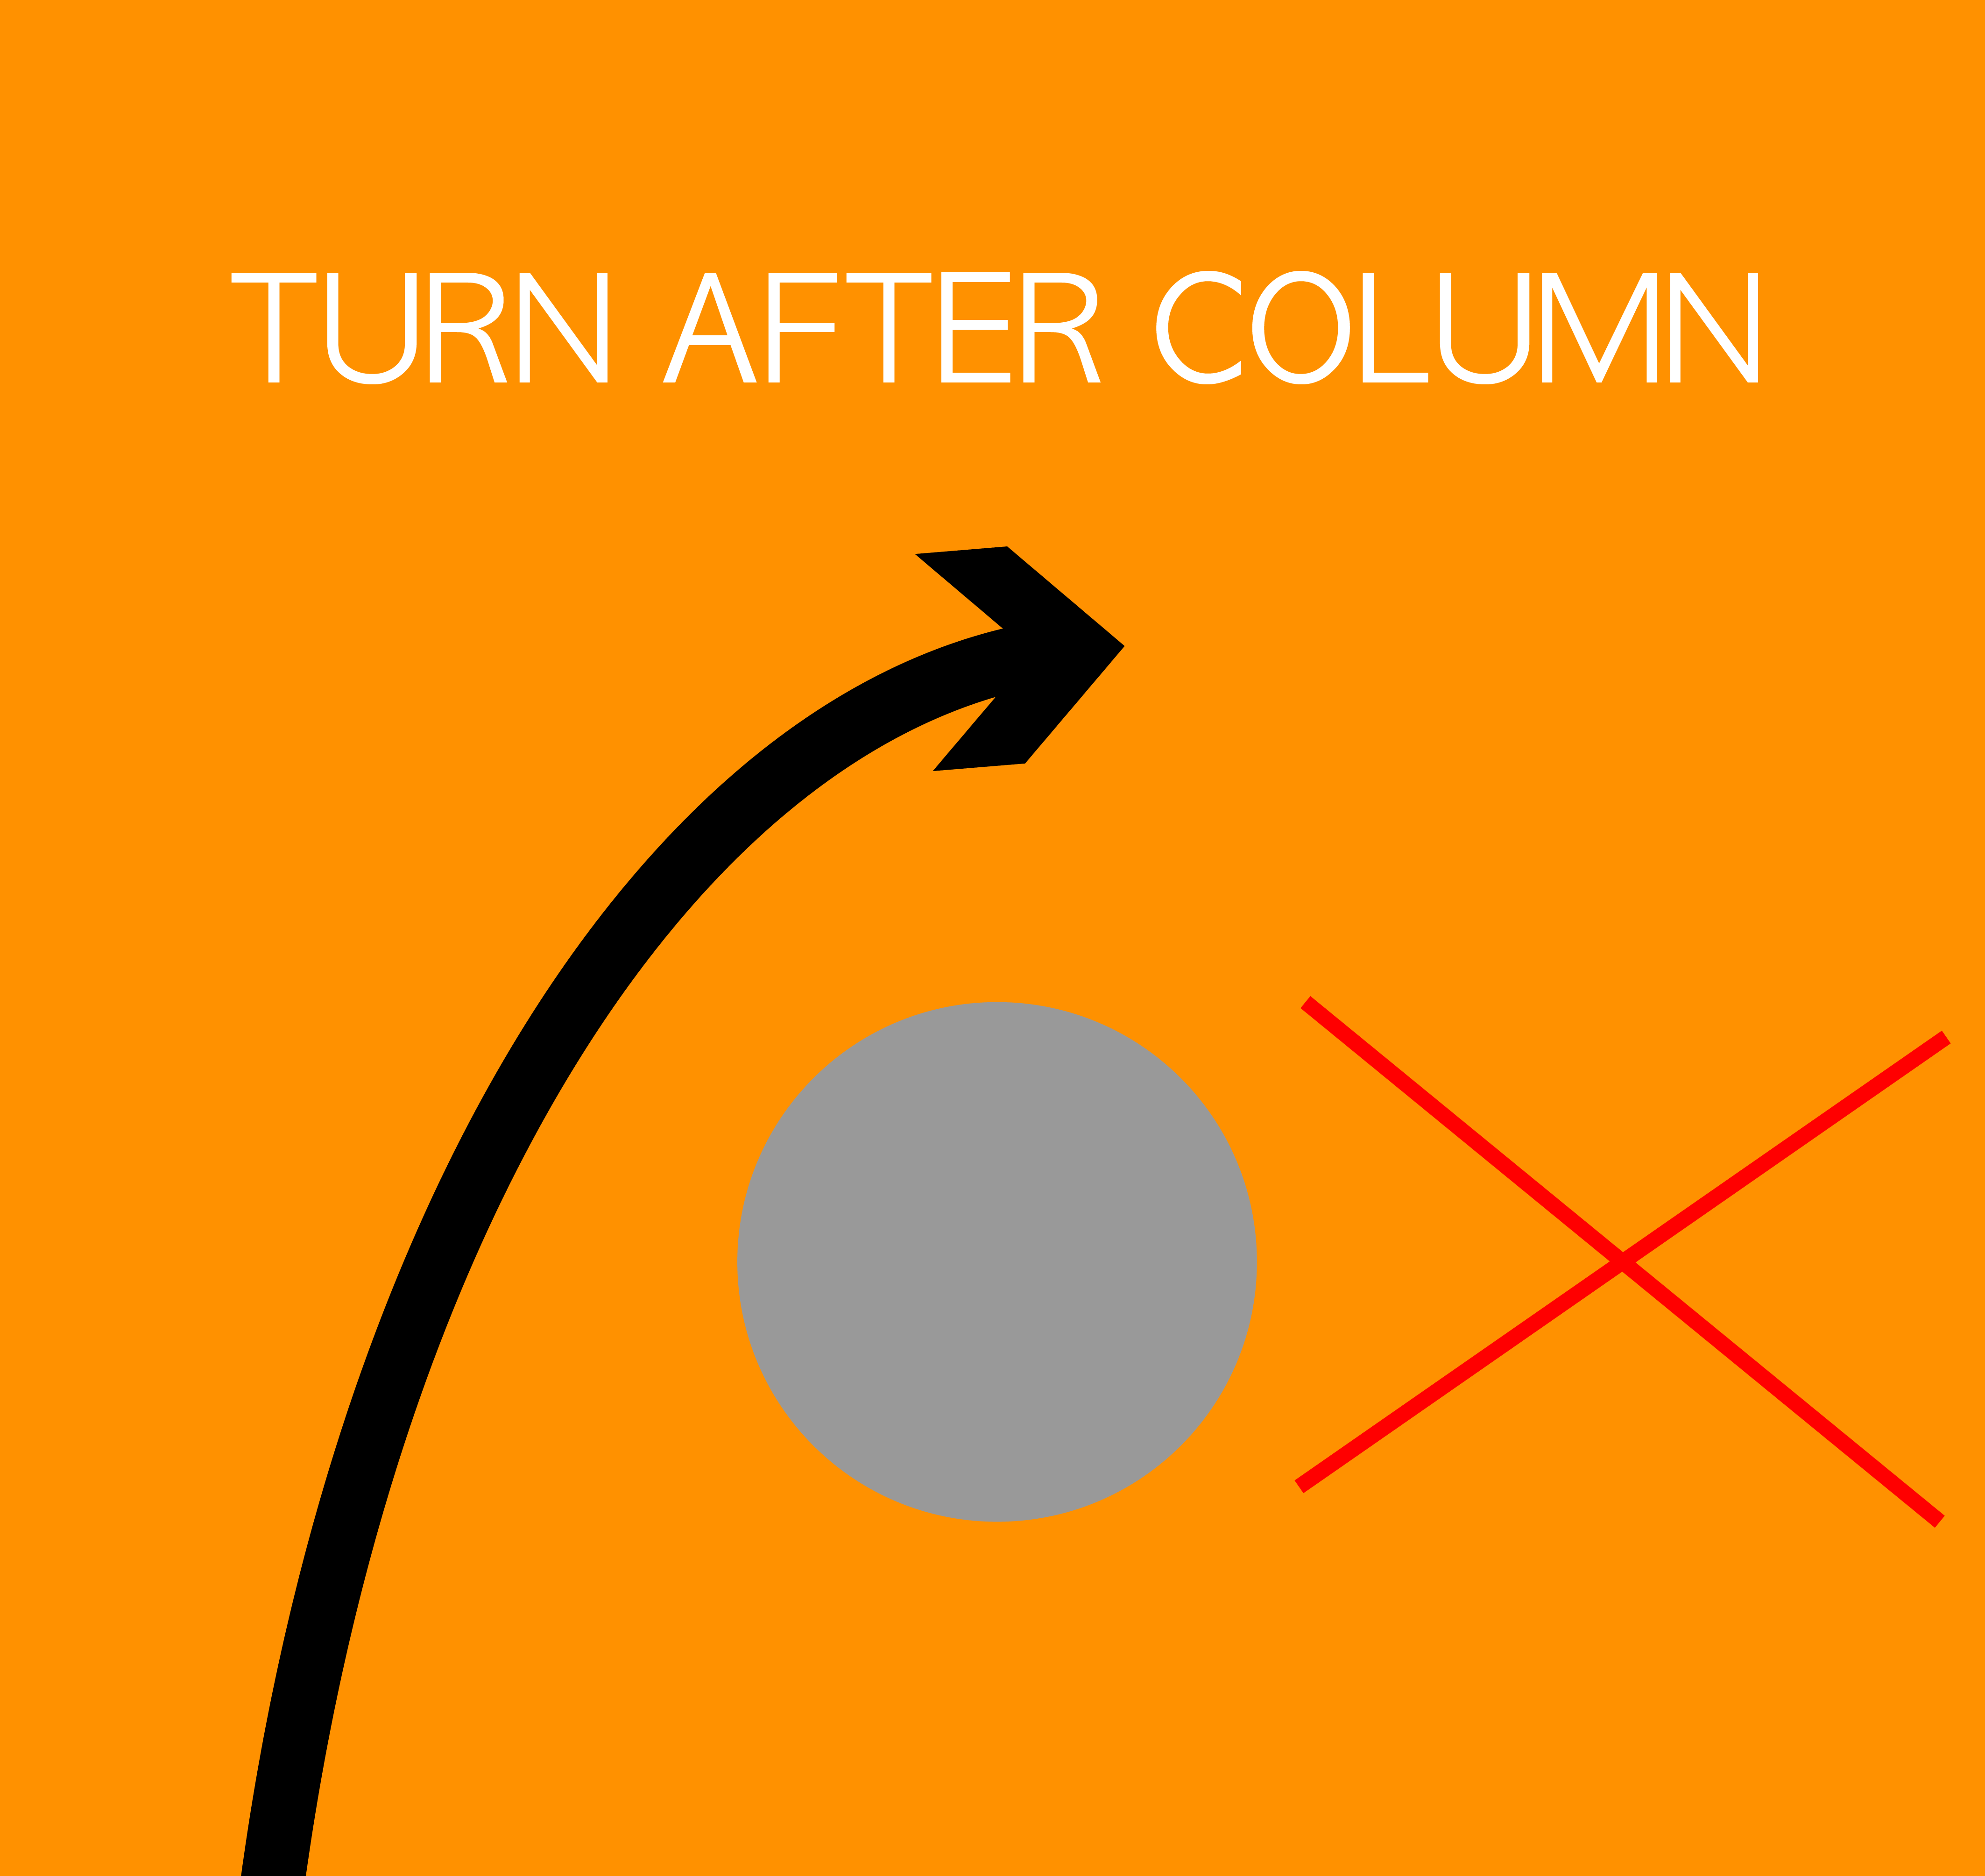 Go Around the Column!